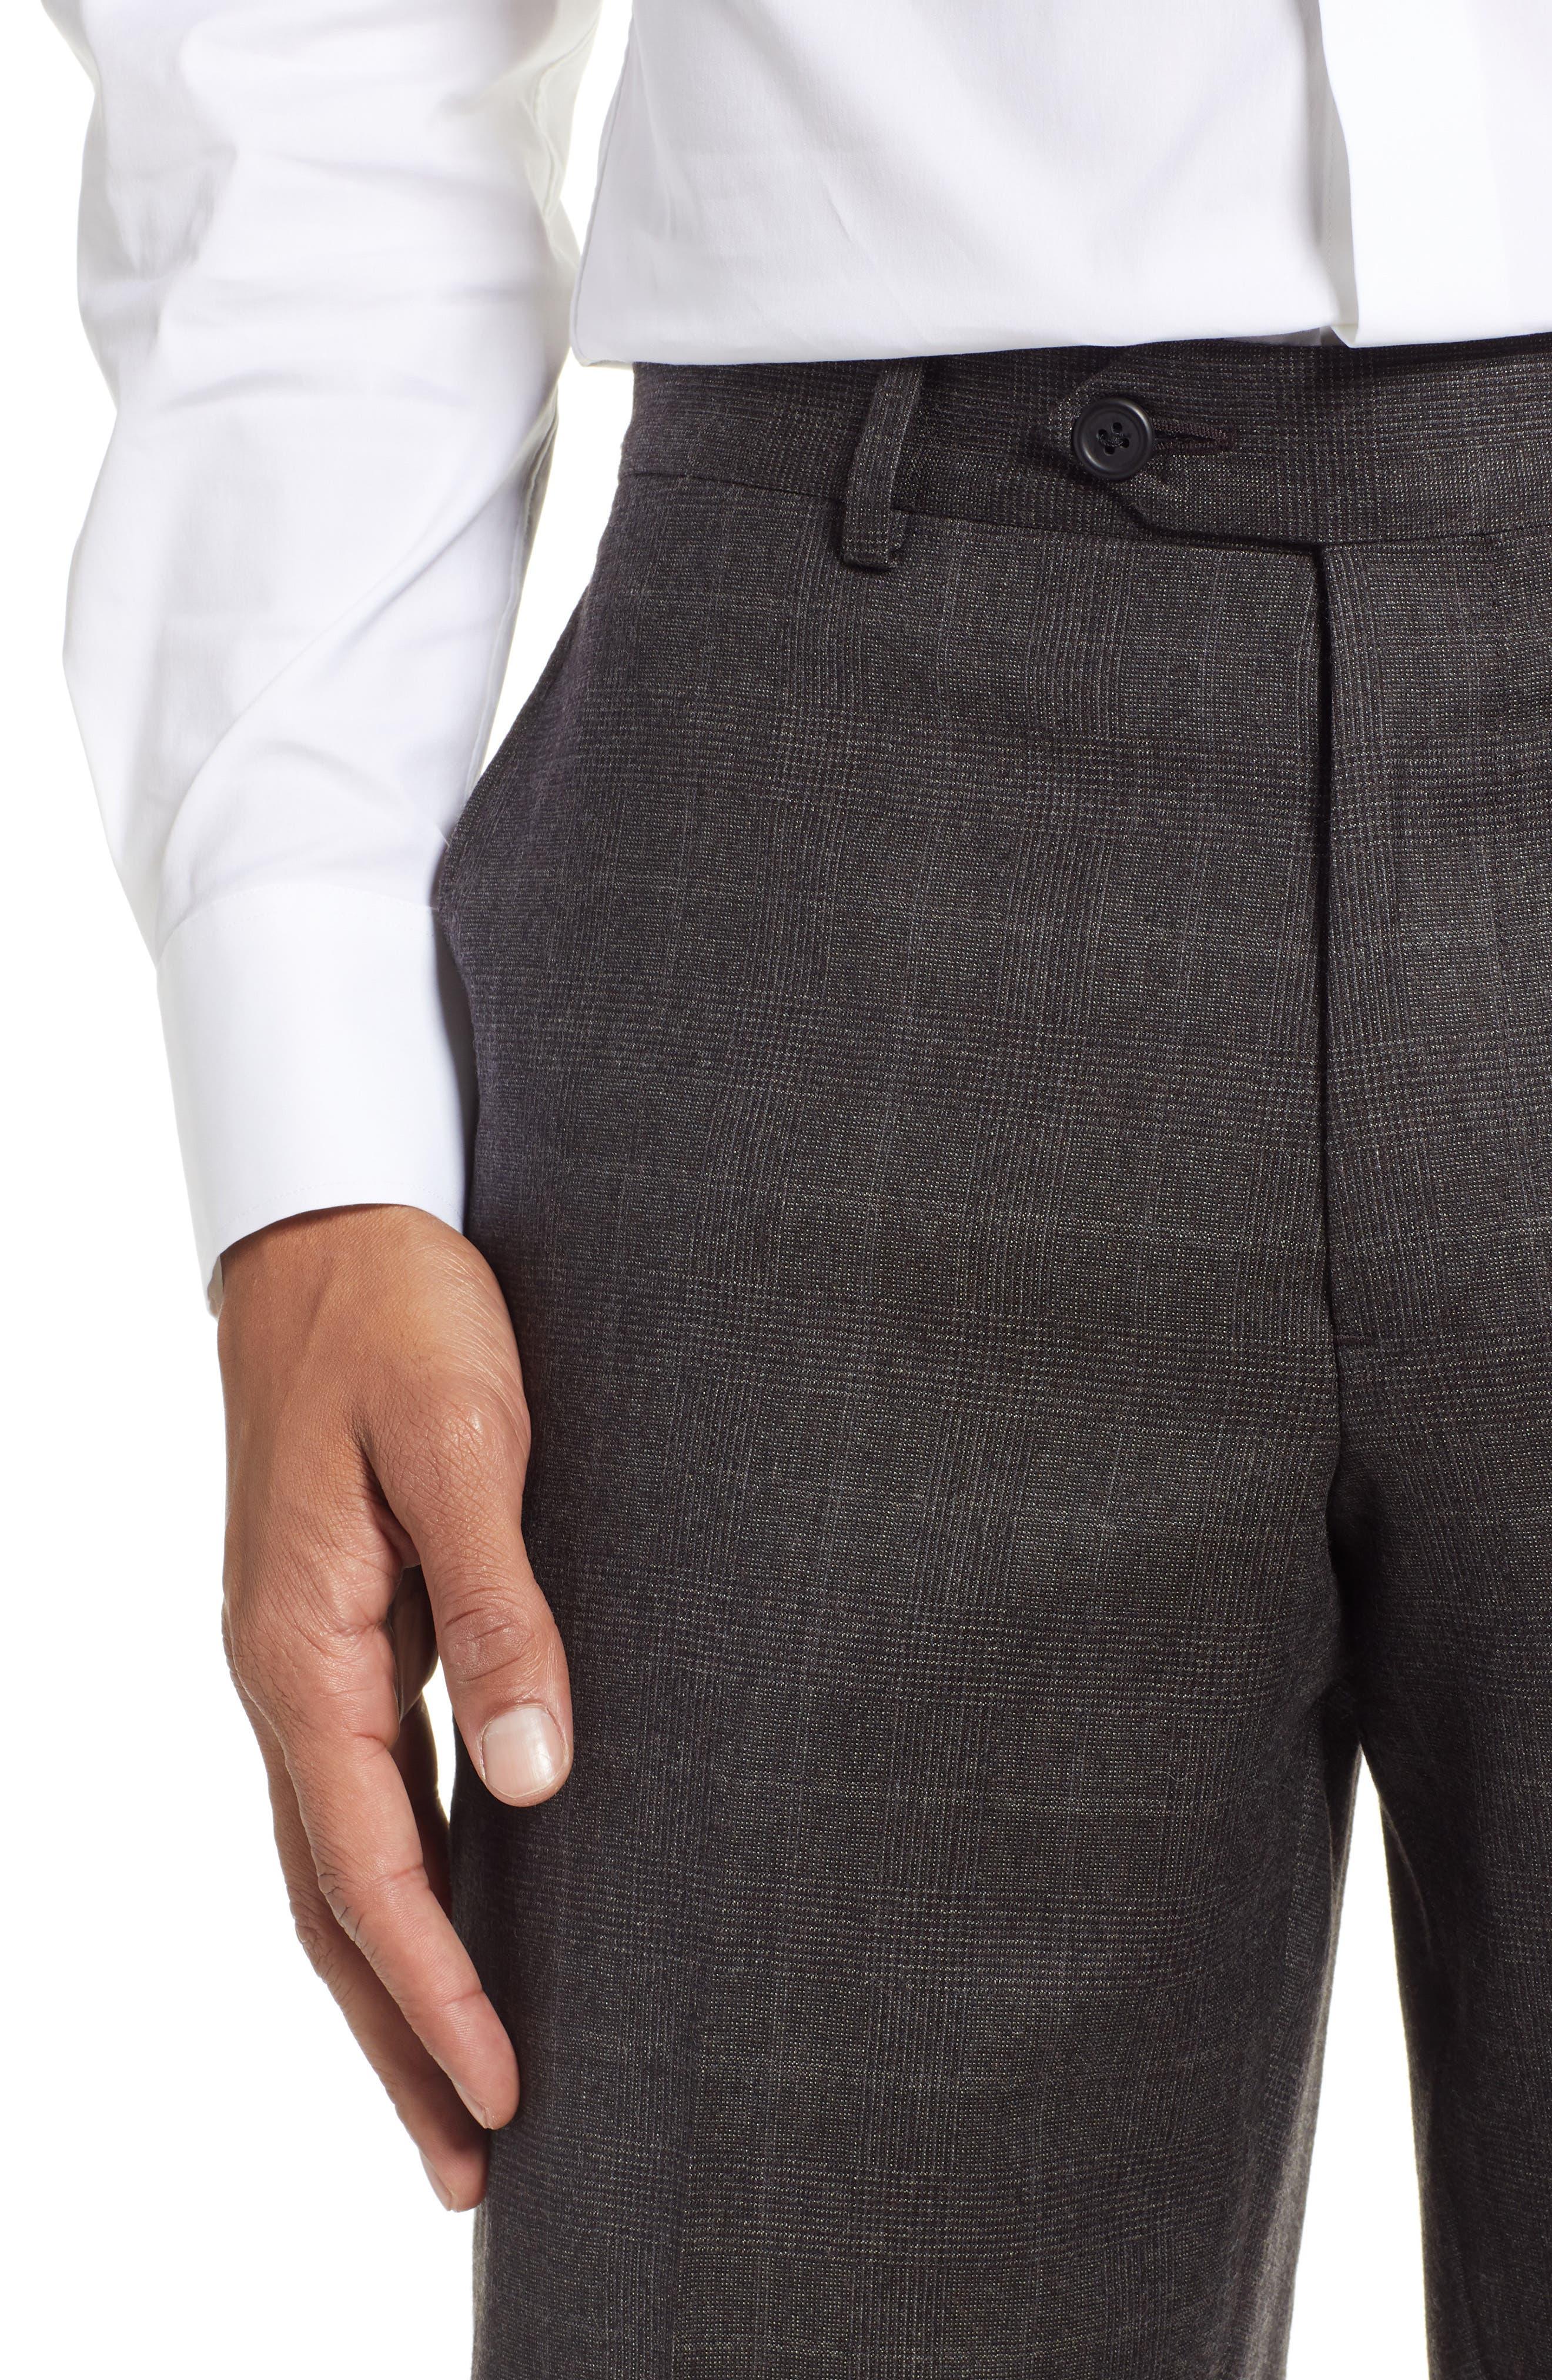 Trim Fit Flat Front Wool Trousers,                             Alternate thumbnail 4, color,                             BLACK